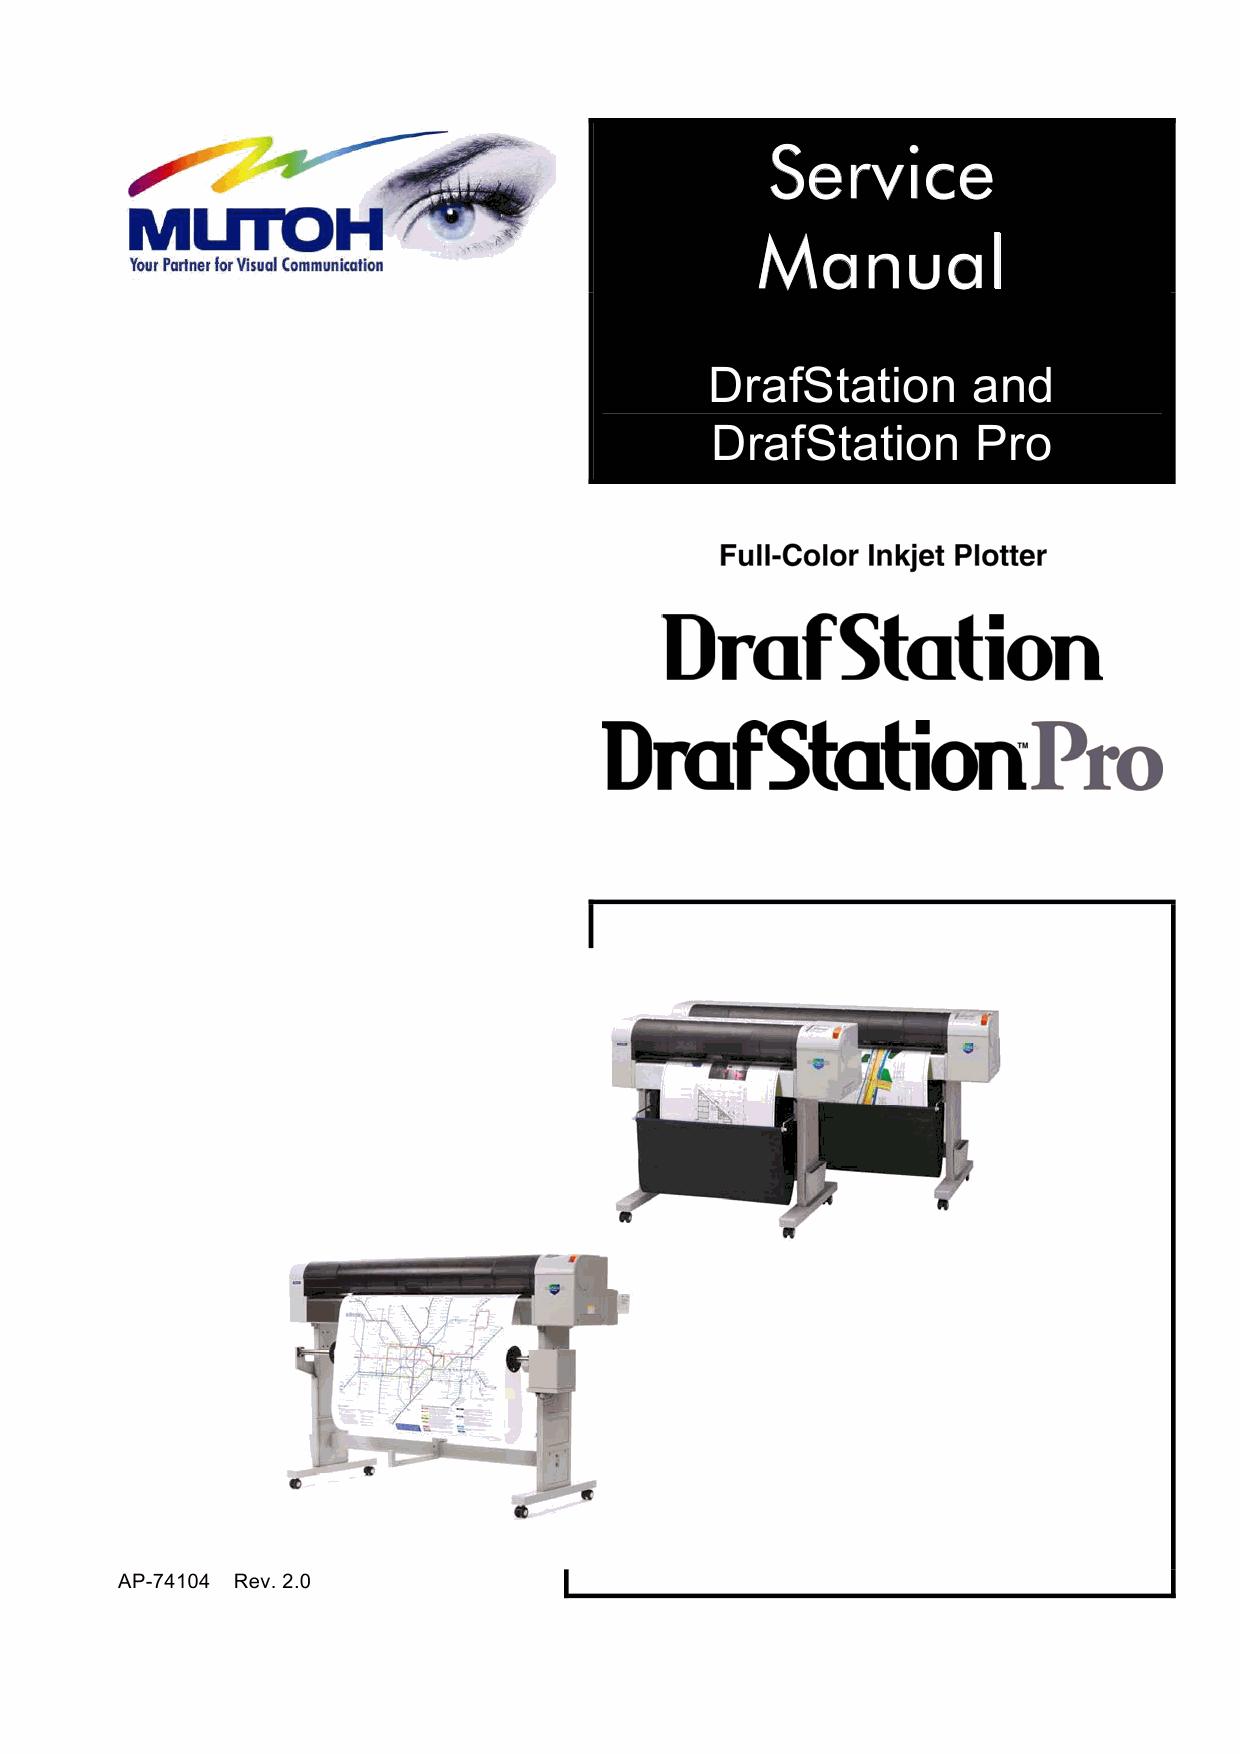 DrafStation RJ-900XG